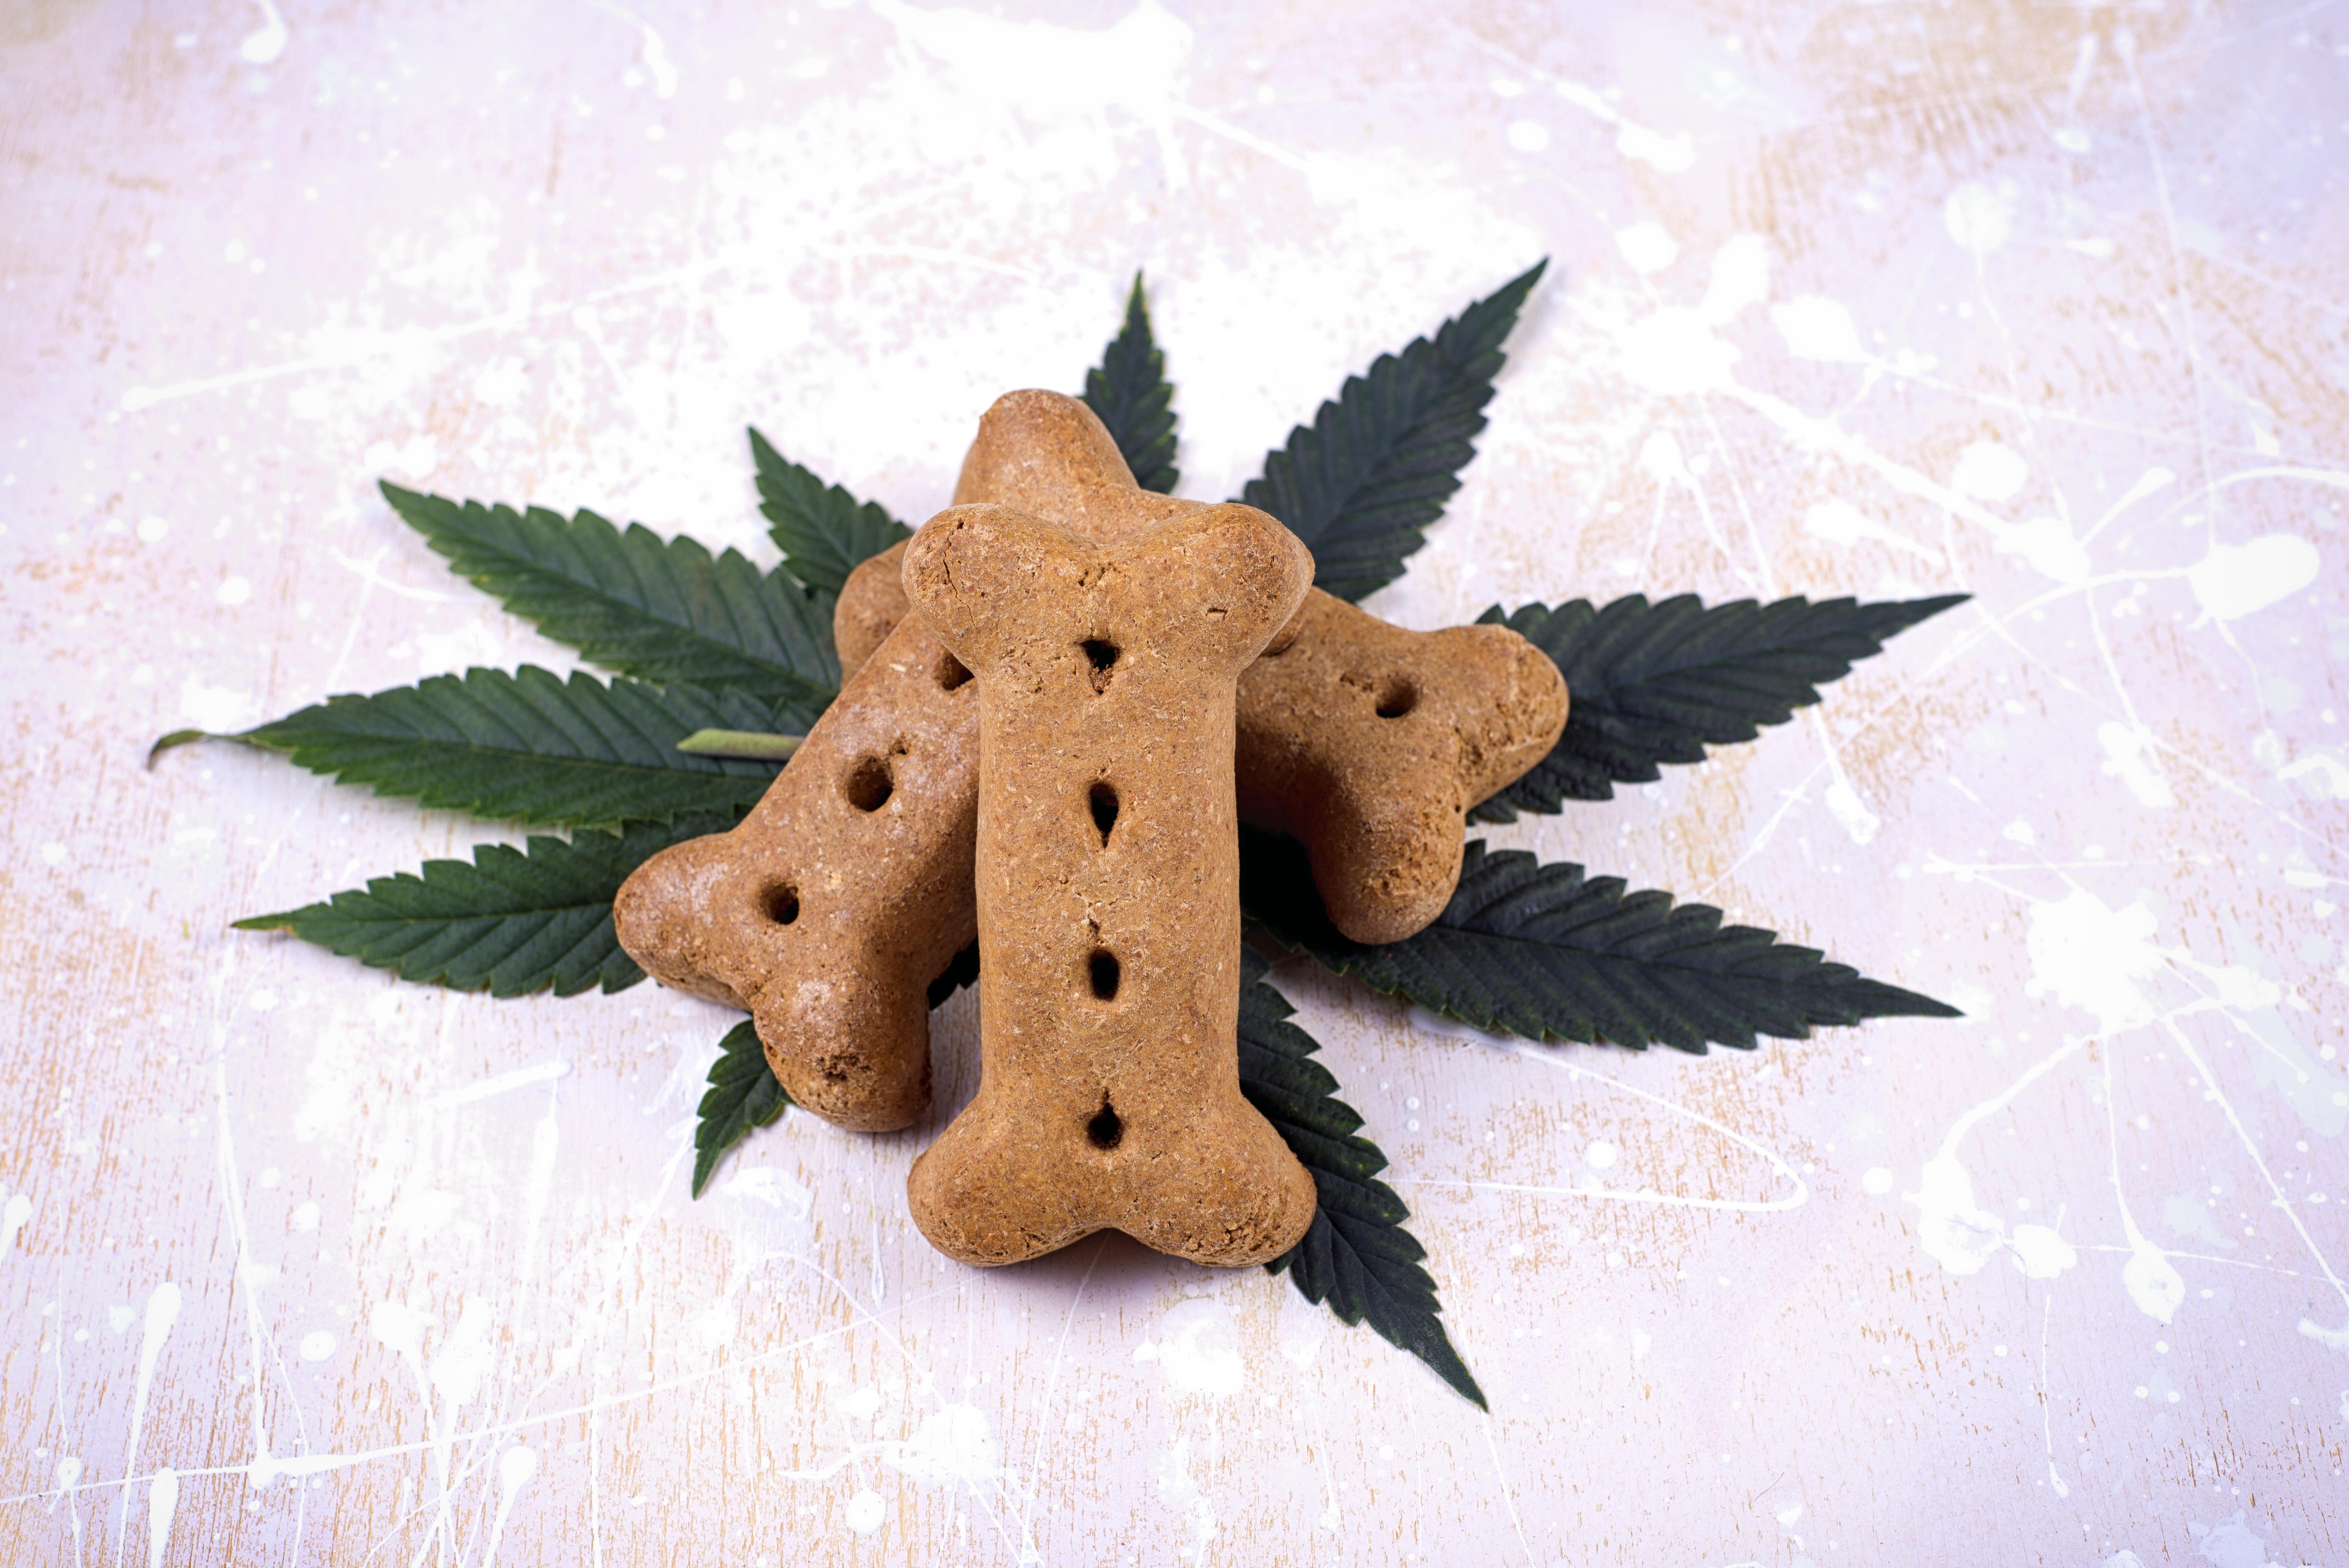 Friday Night Inc. begins marketing cannabis pet products